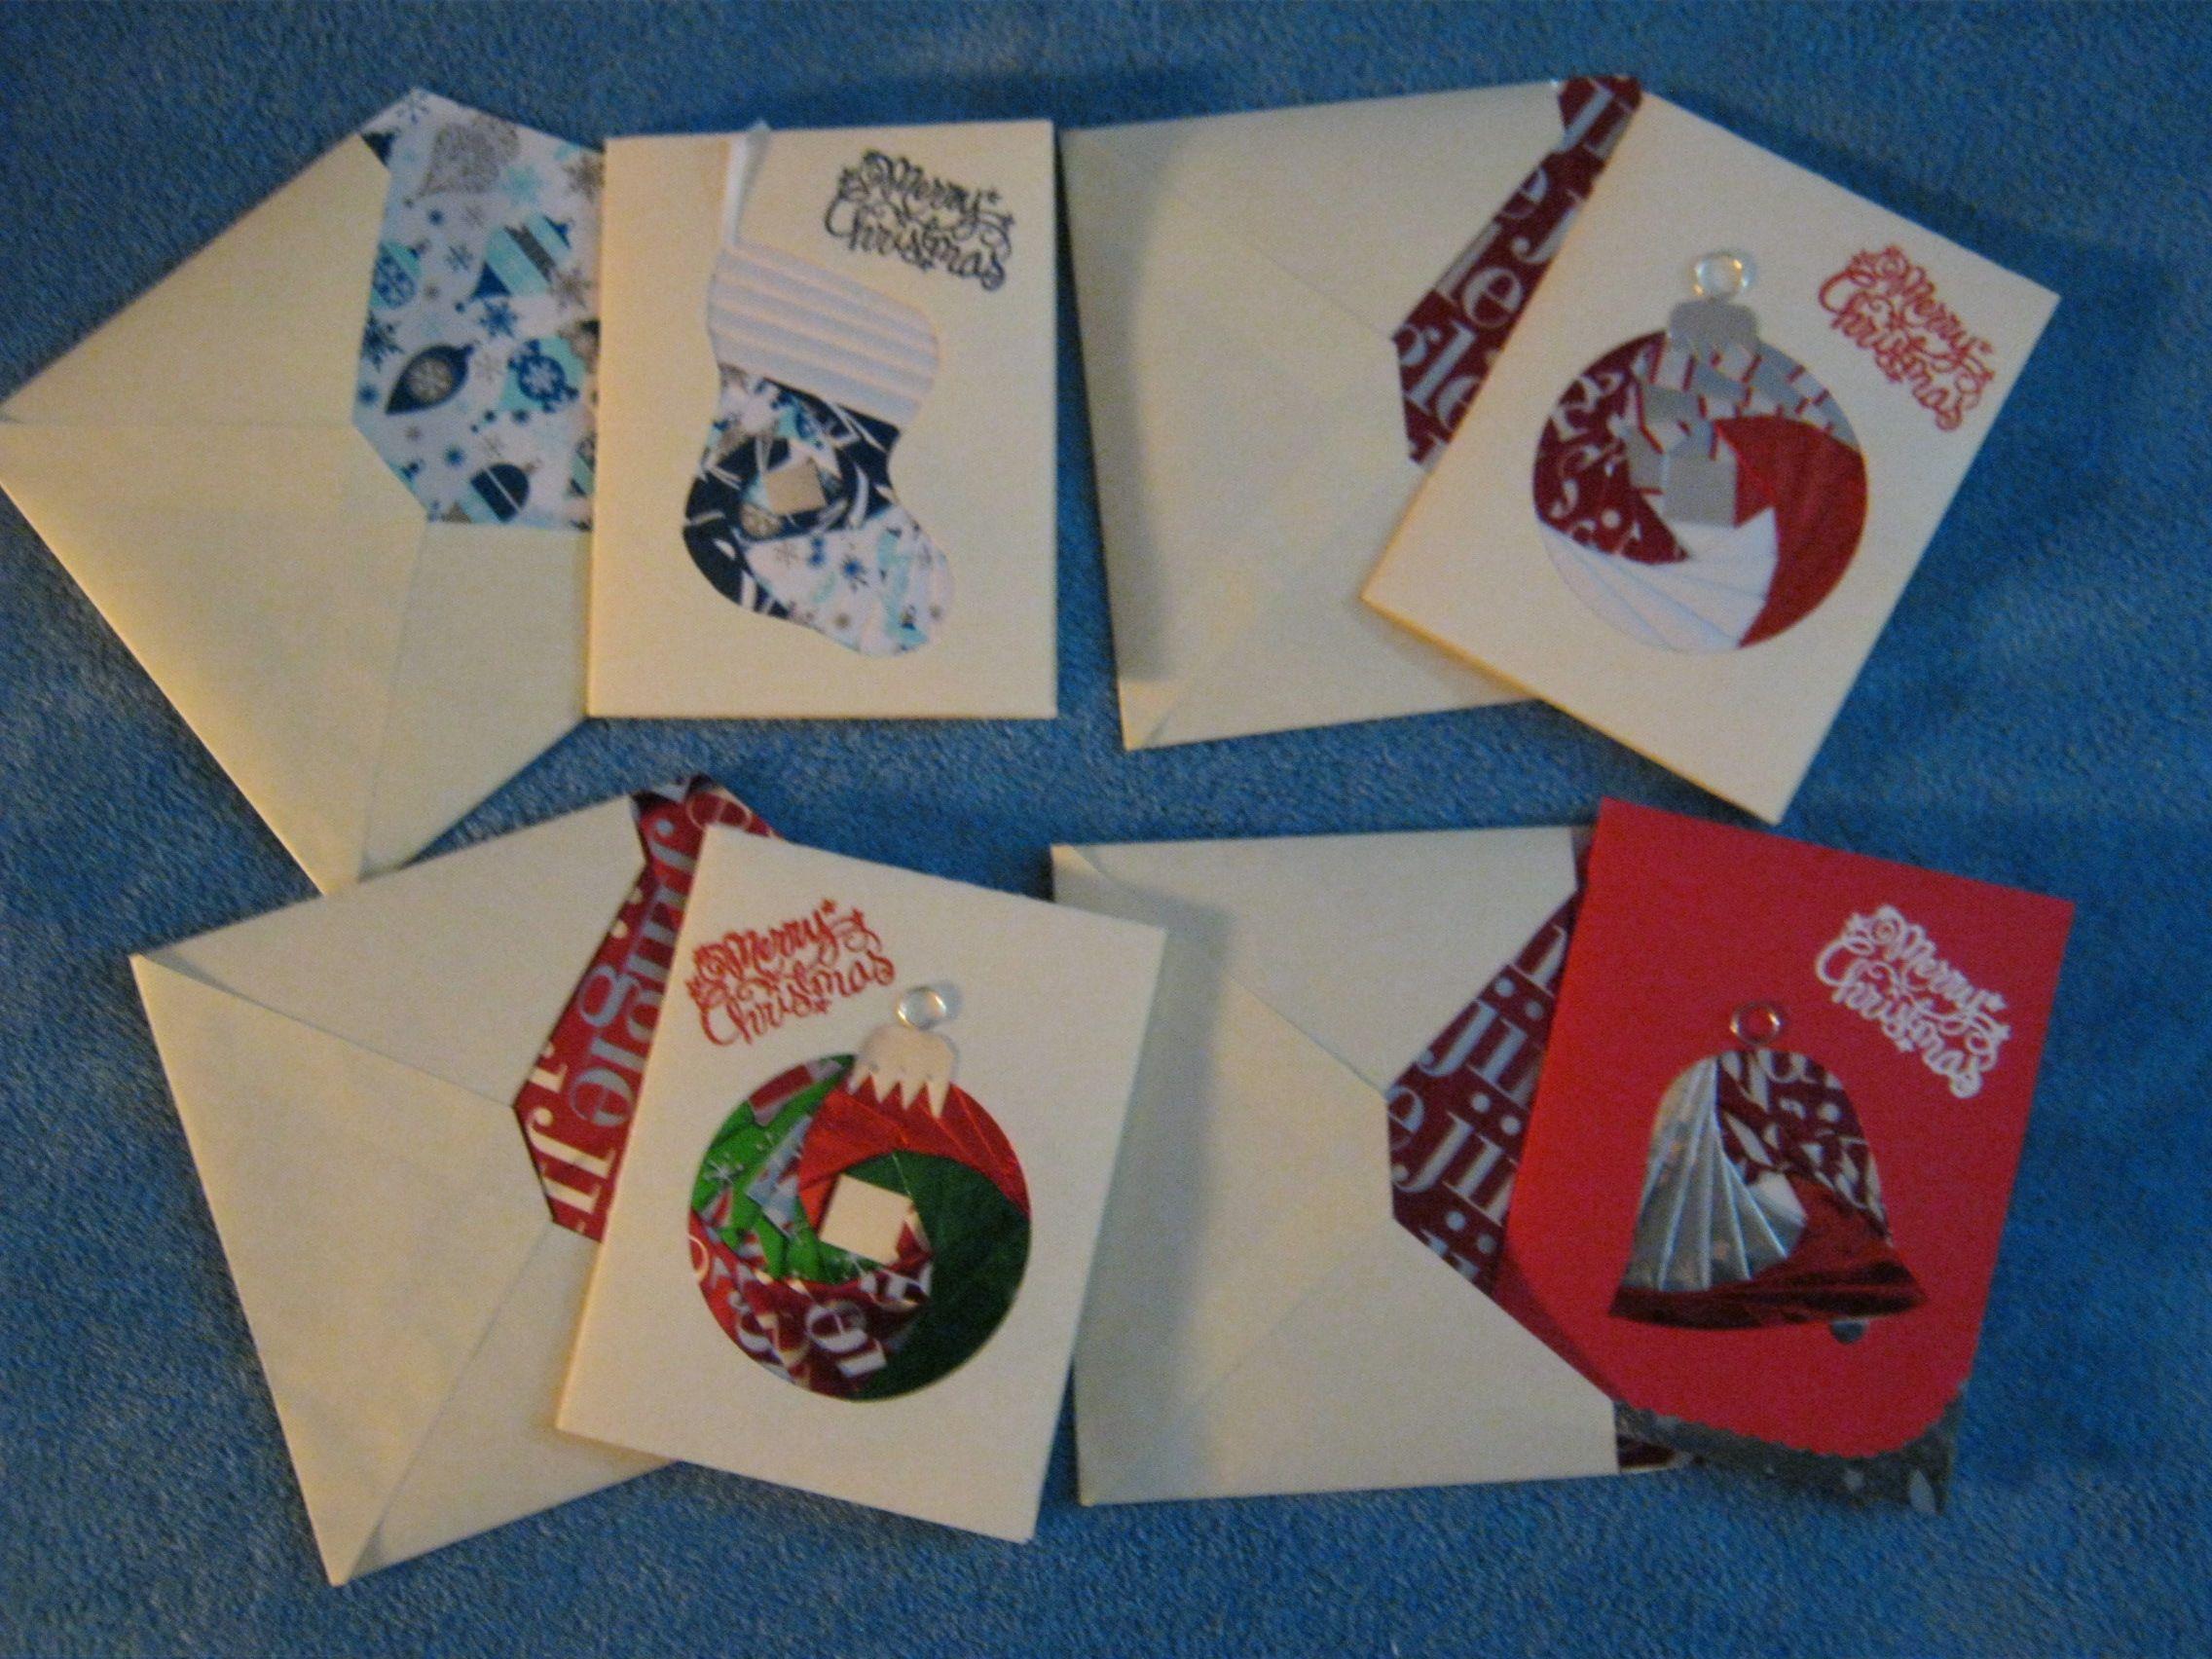 Iris Folding Christmas Cards For 2012